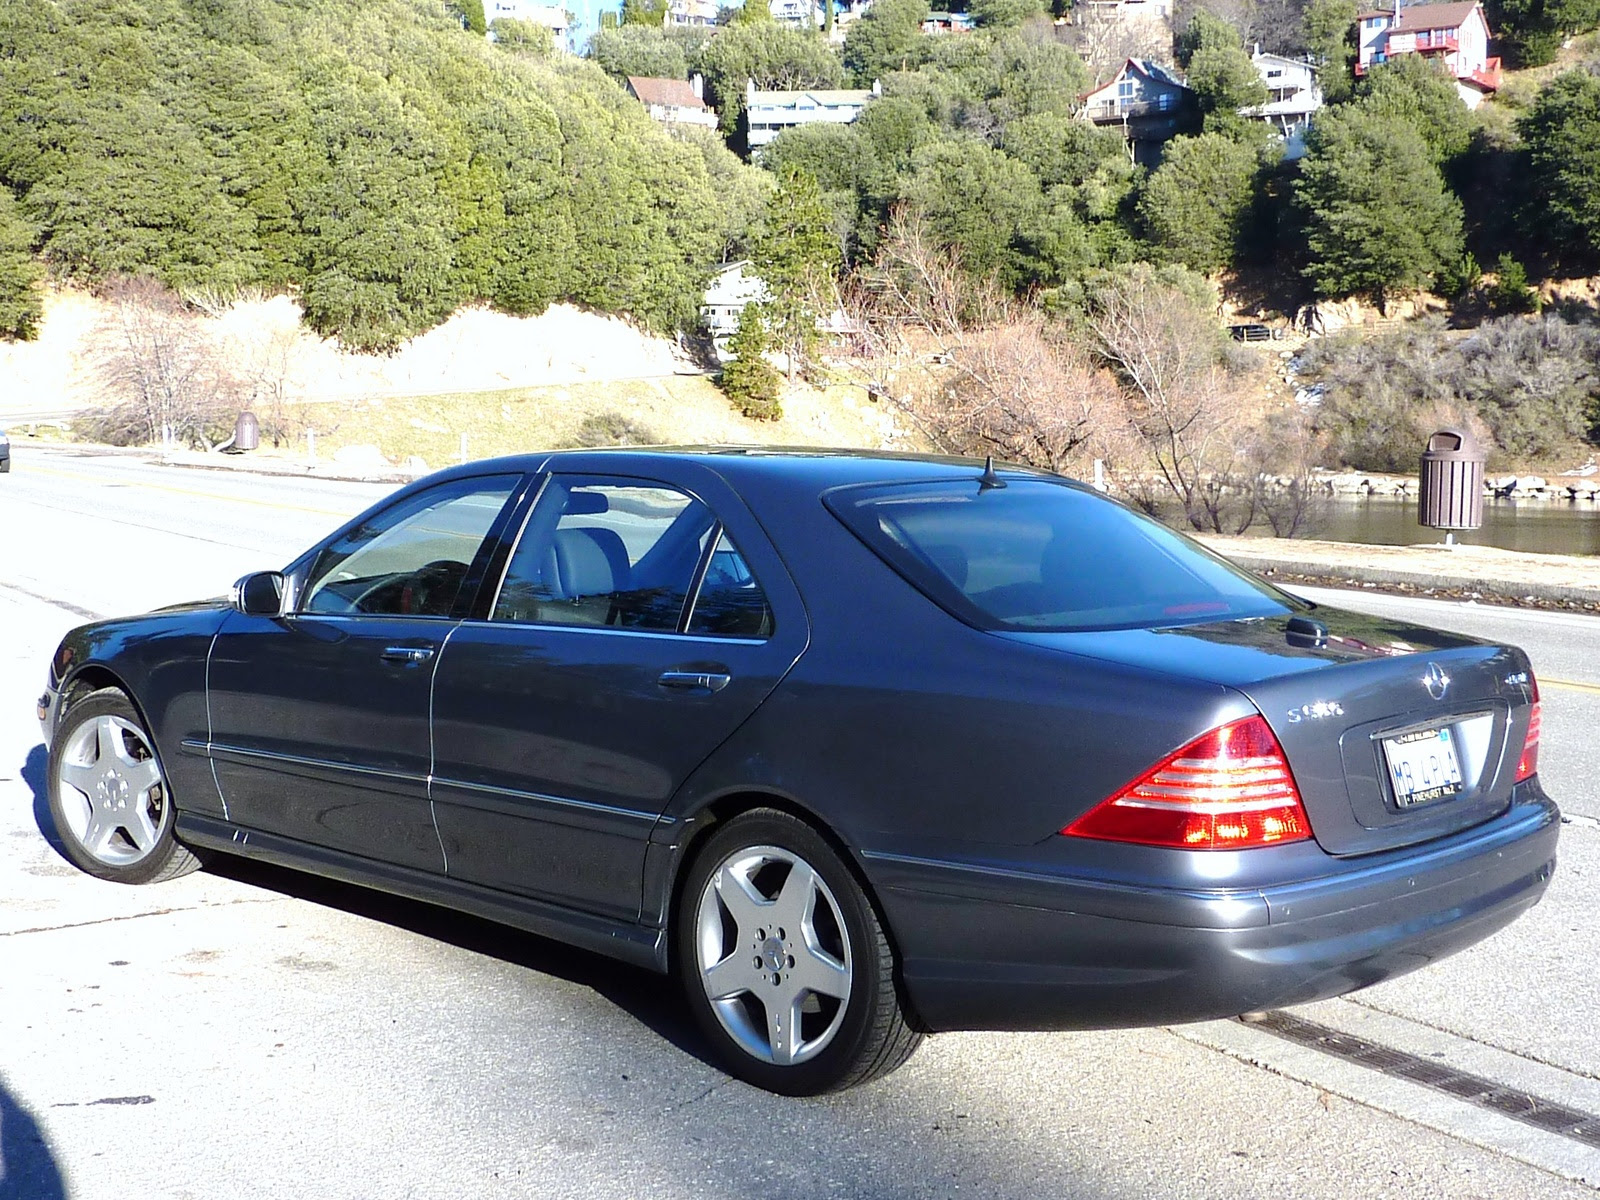 2006 Mercedes-Benz S-Class - Pictures - CarGurus